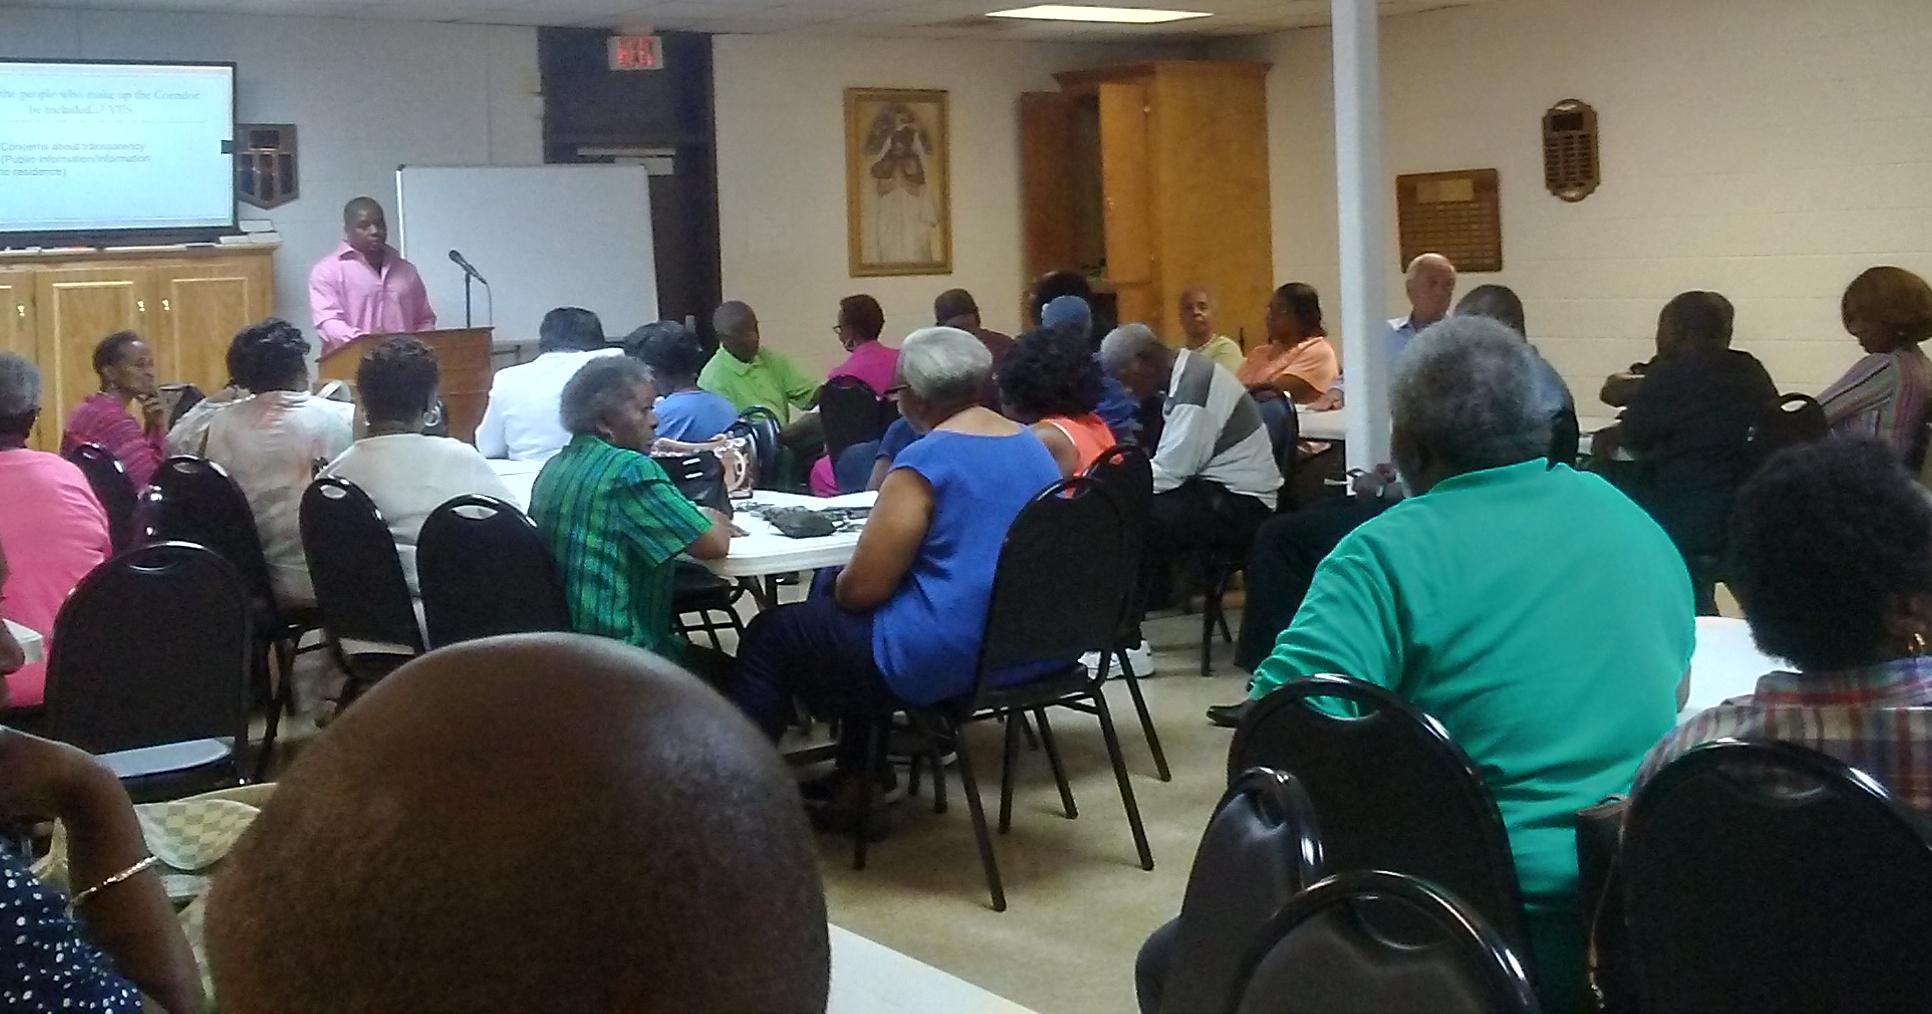 community organizing meeting at church